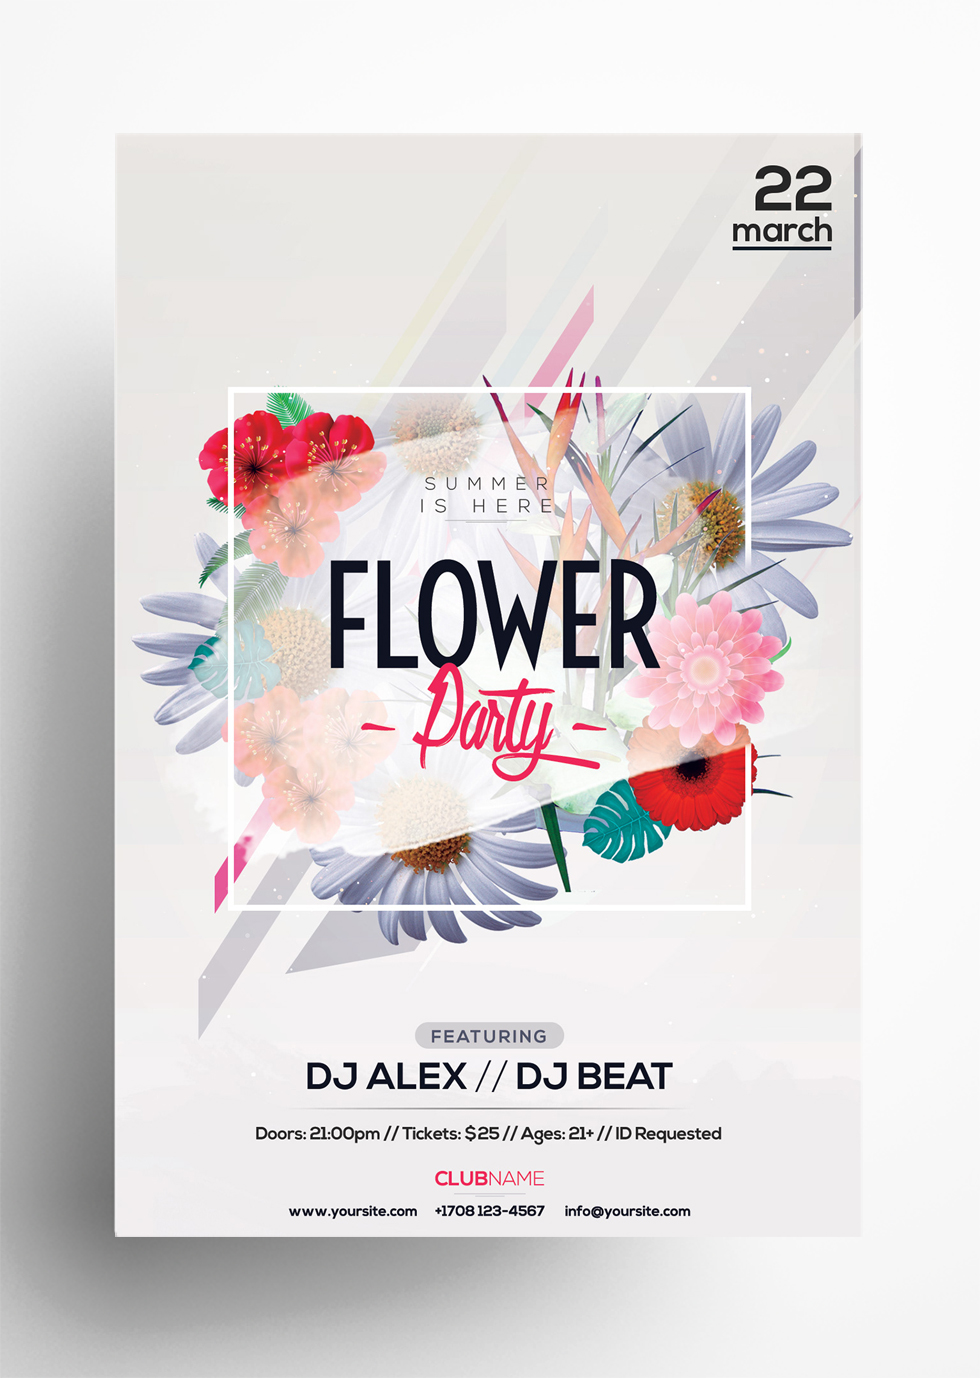 Flower Party - Freebie Summer PSD Flyer Template